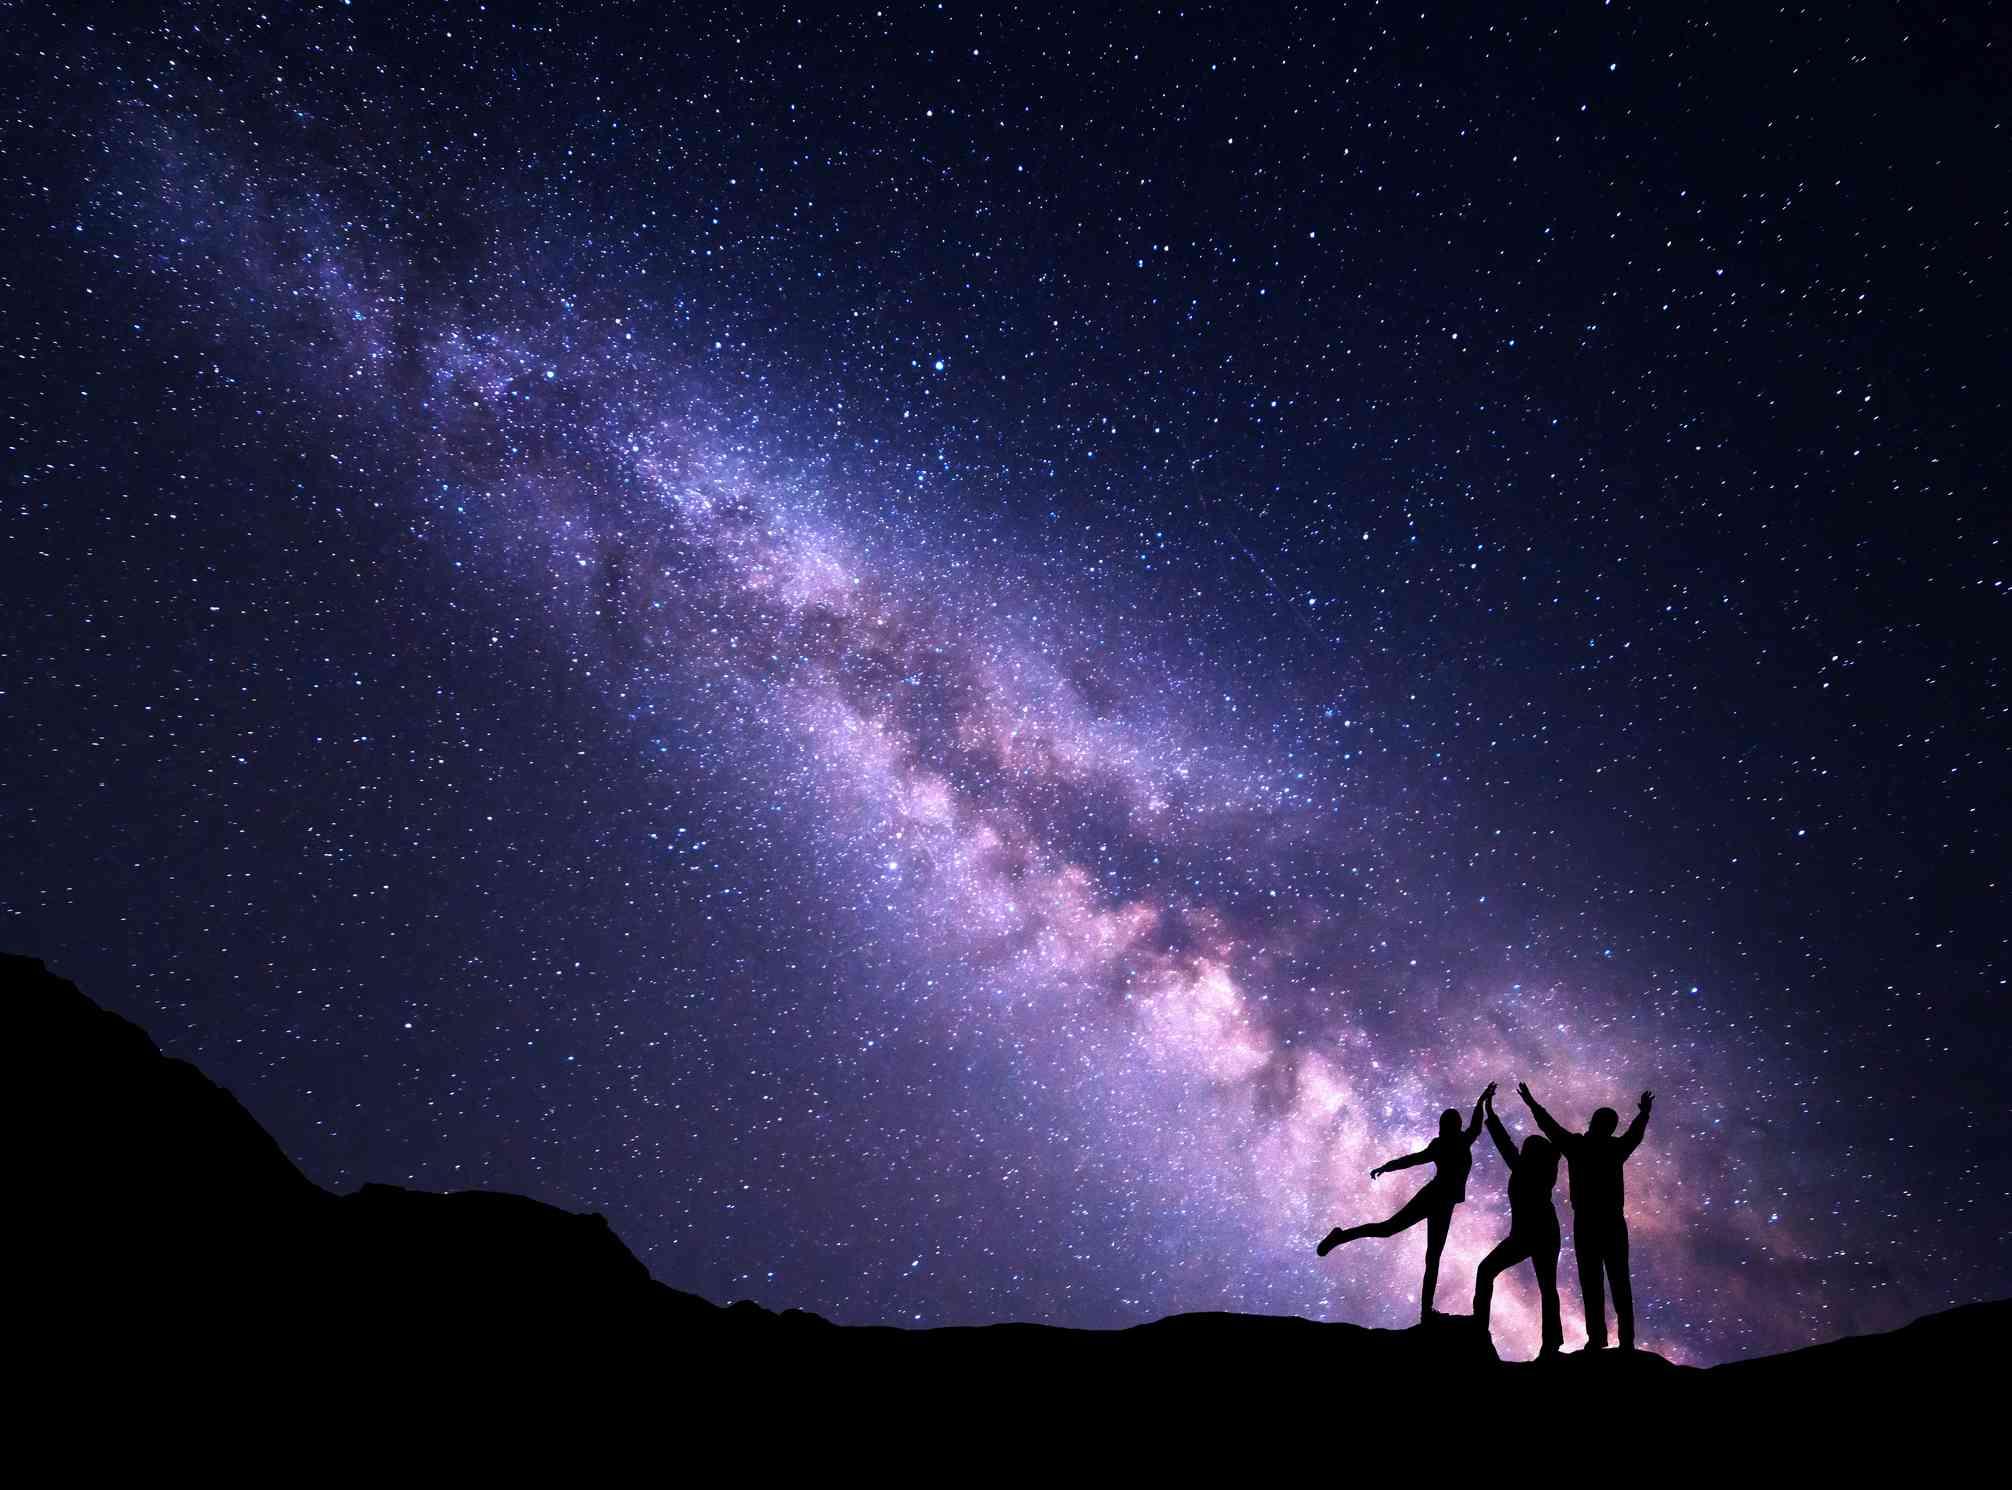 Silhouette of three friends stargazing